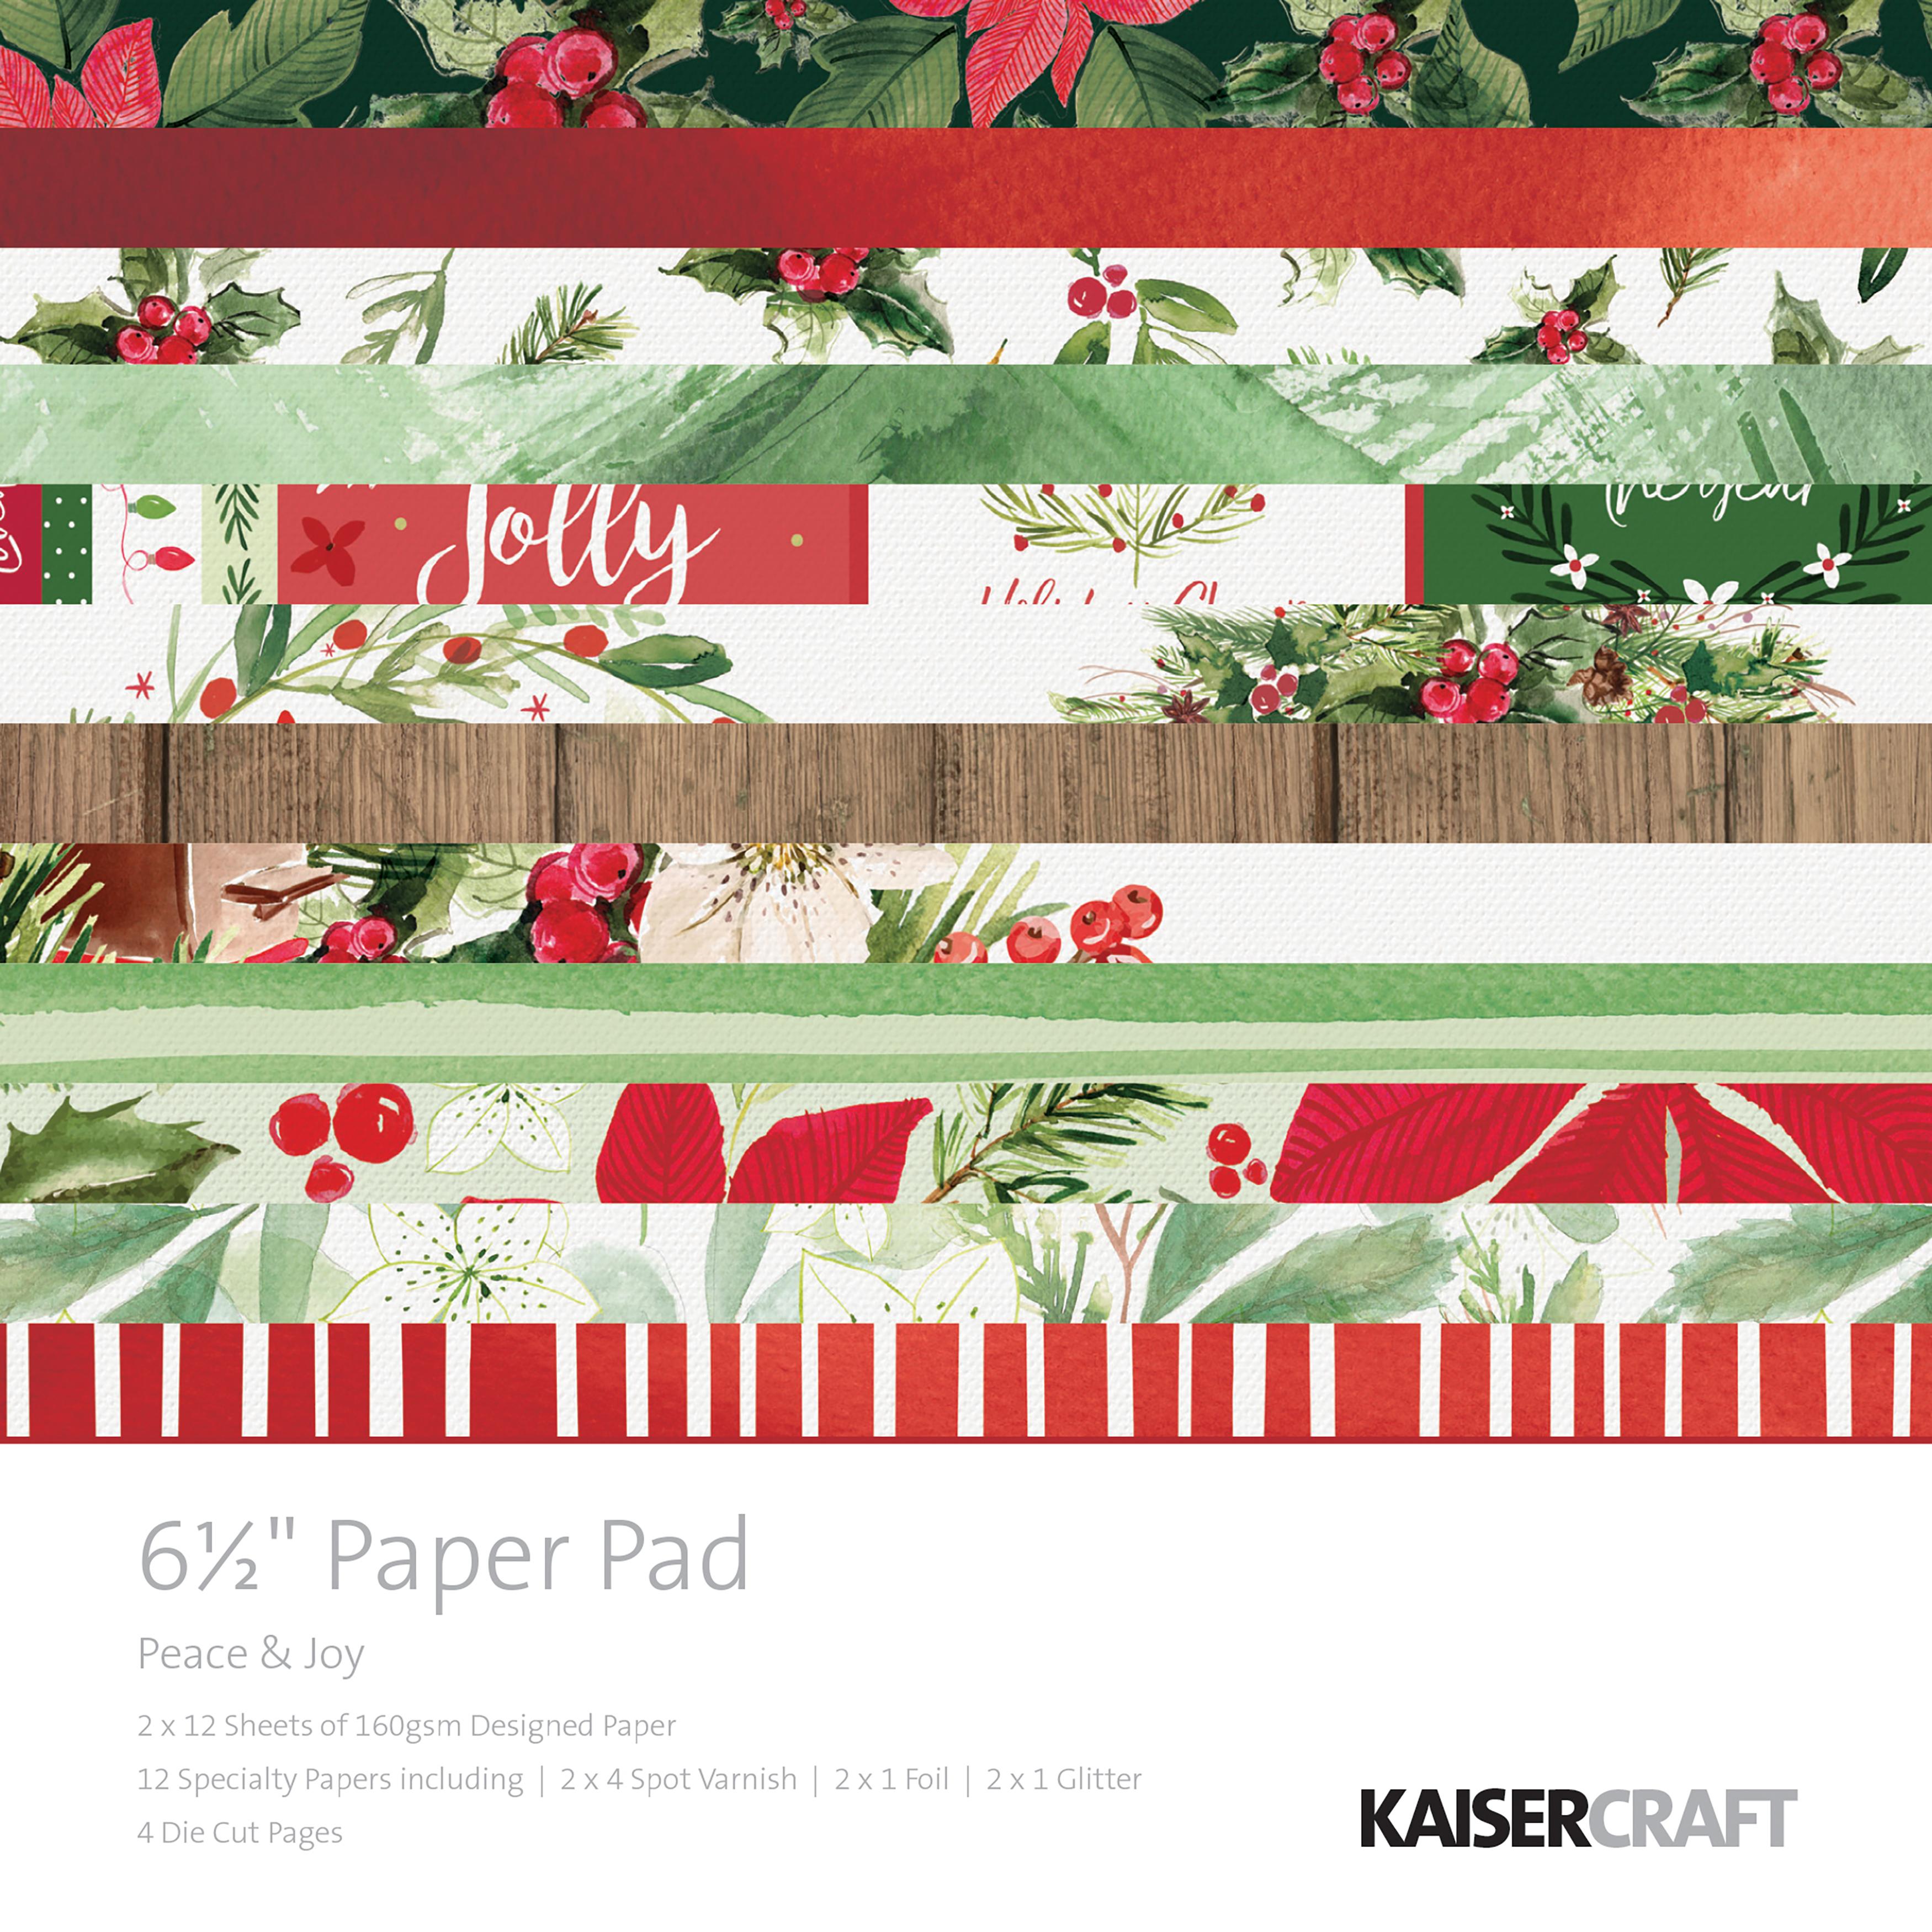 Kaisercraft Paper Pad 6.5X6.5 40/Pkg-Peace & Joy